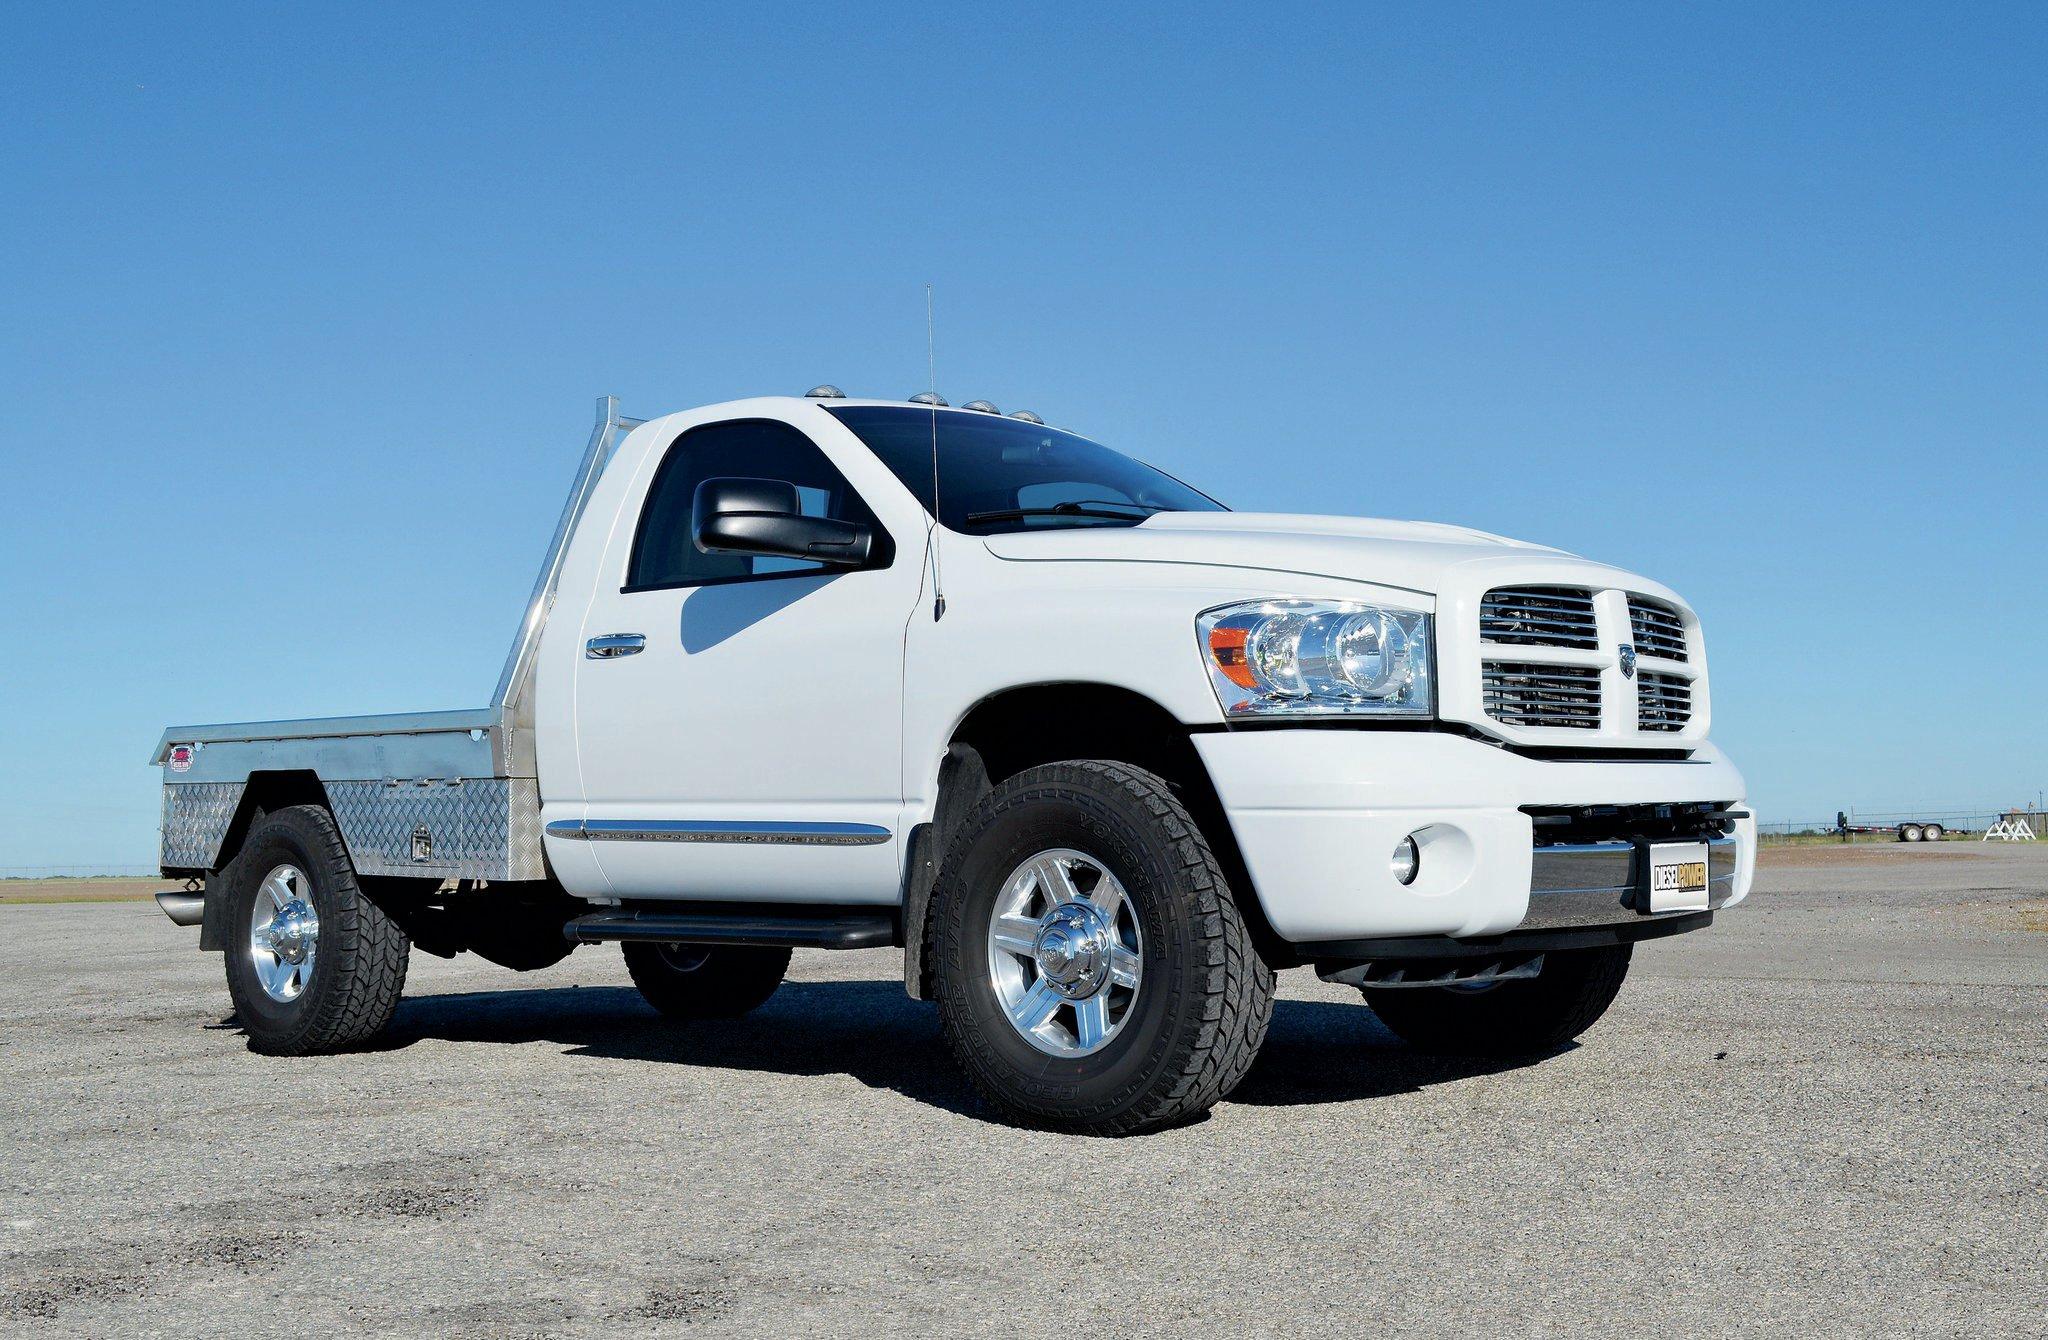 One Wicked 800 Hp 2007 Dodge Ram 2500 Work Truck